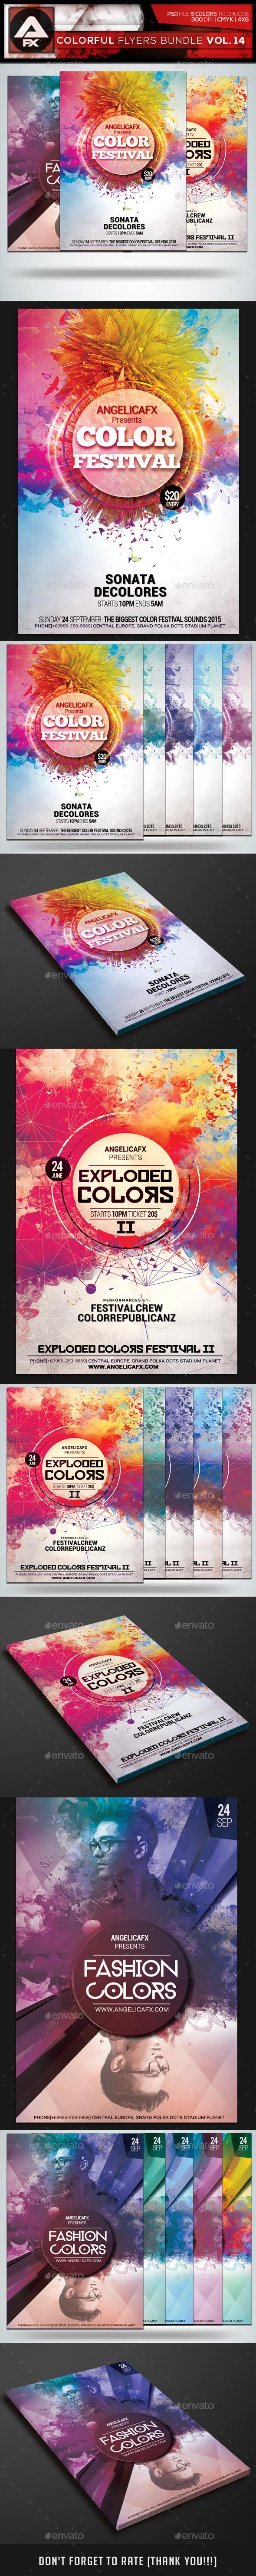 Colorful Flyers Bundle Vol.14 - Clubs & Parties Events